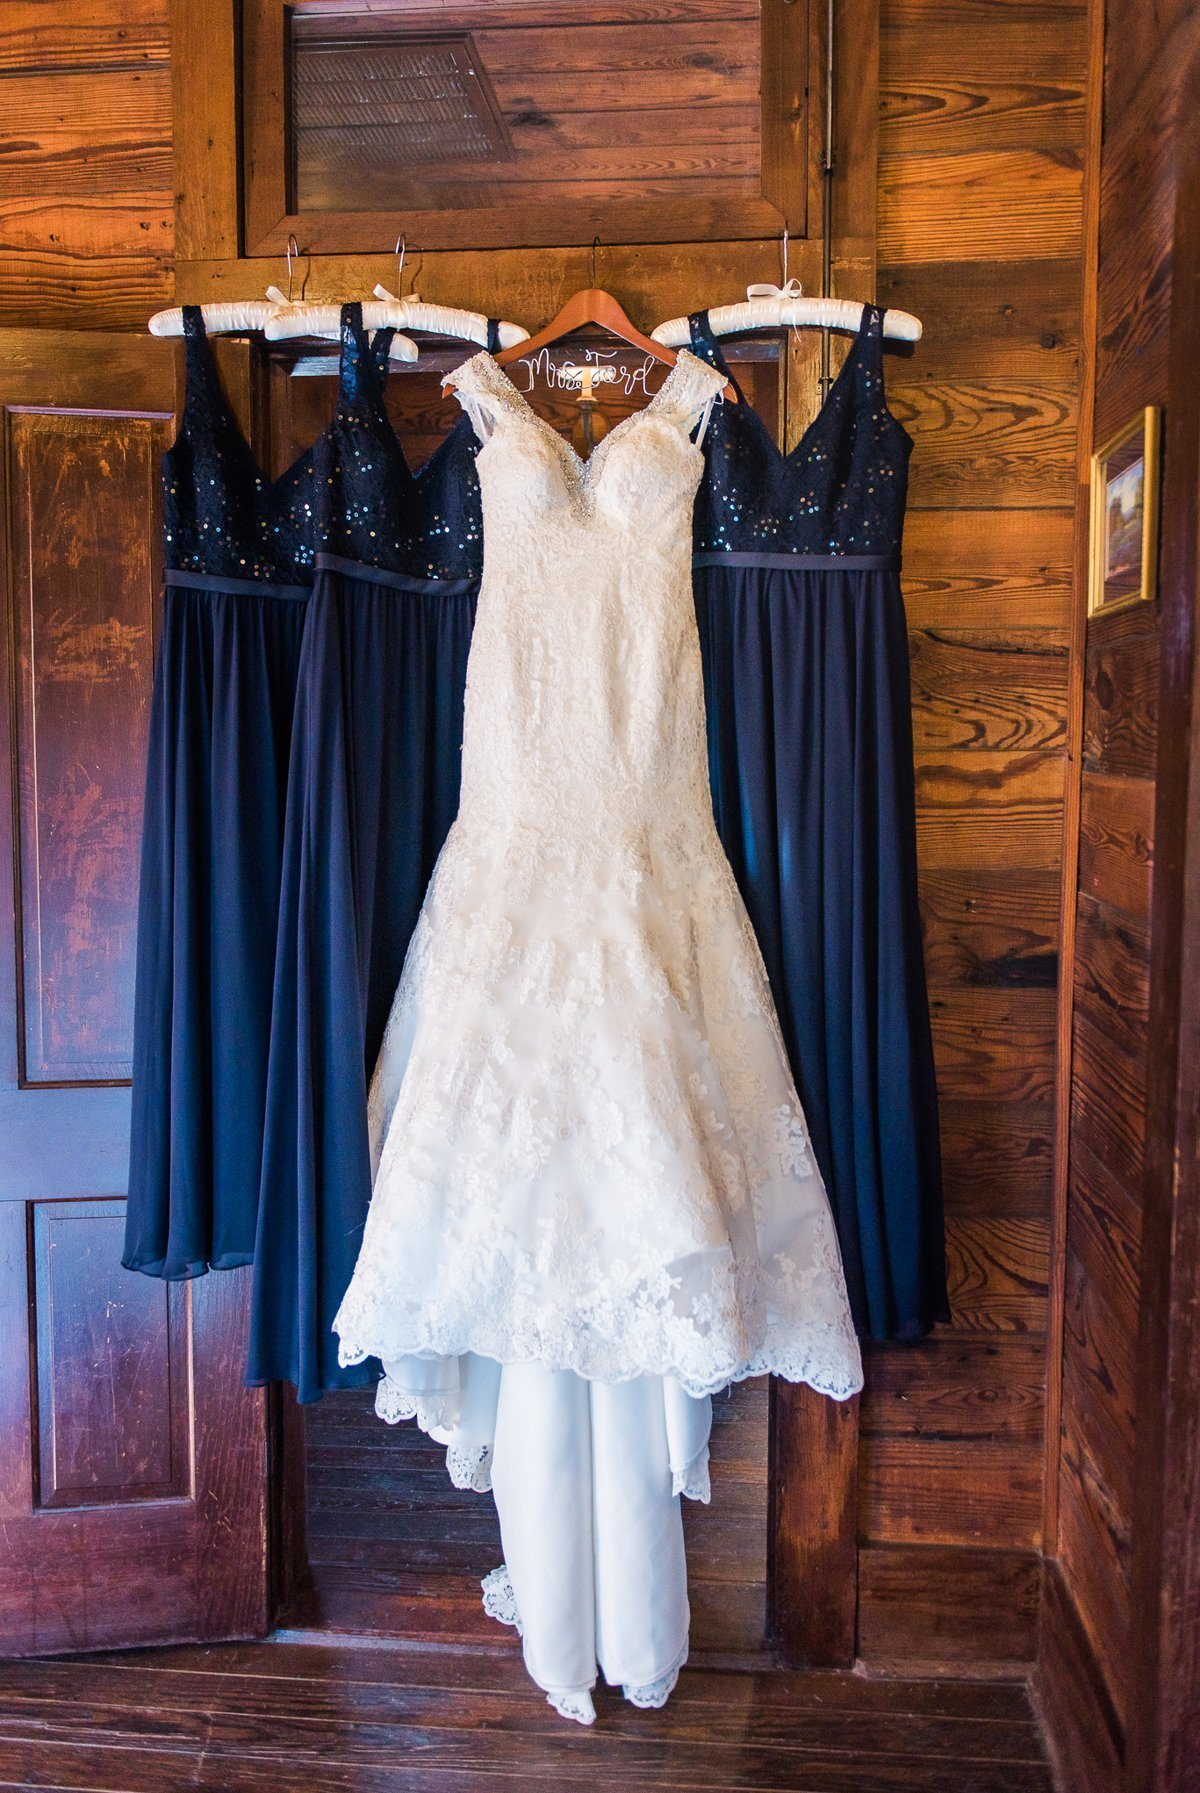 Montesino Ranch Wedding dress and bridesmaid dresses